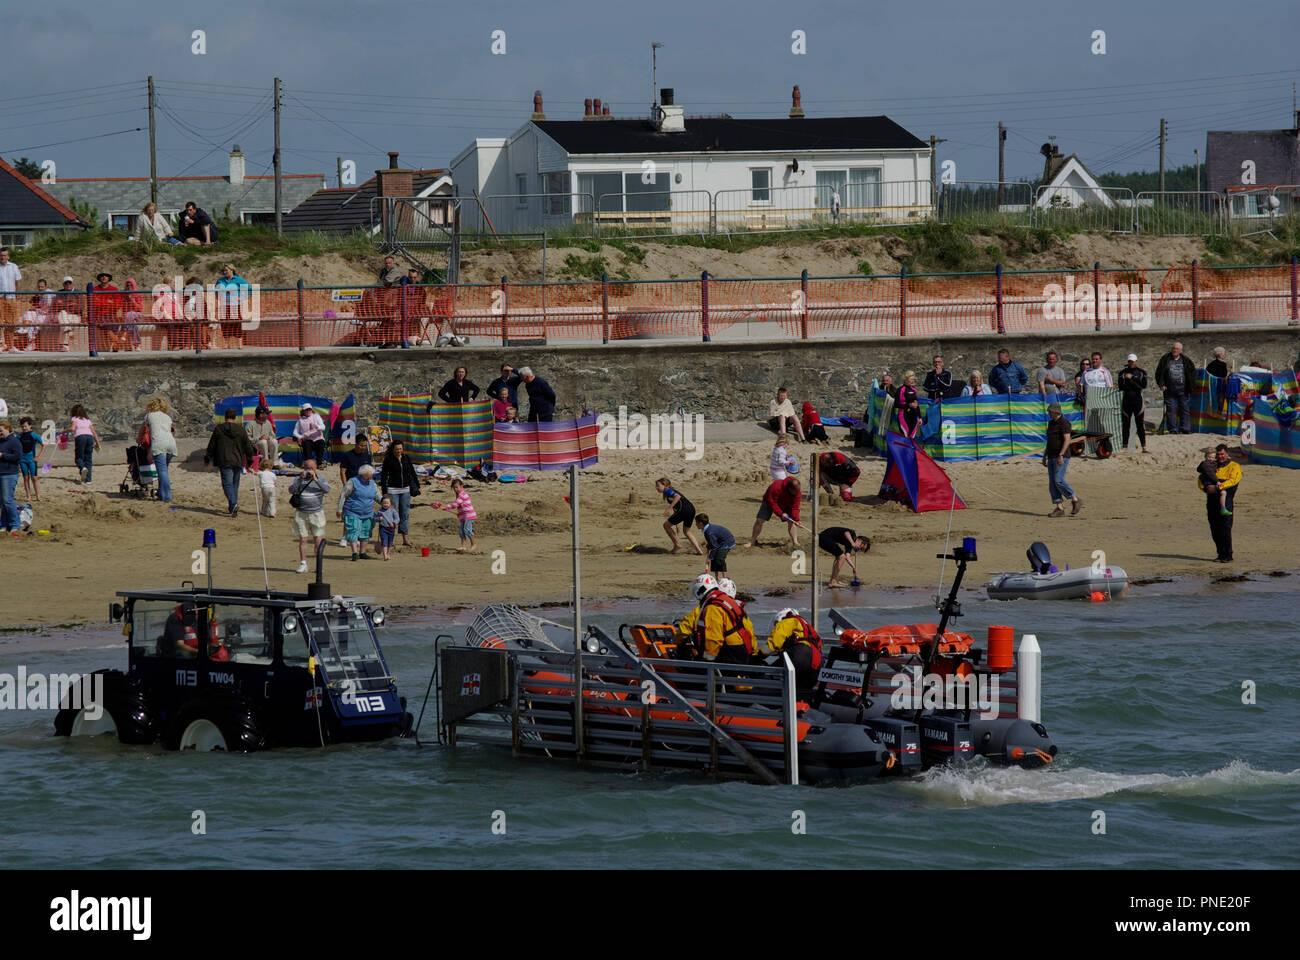 Trearddur Bay Lifeboat Launching - Stock Image